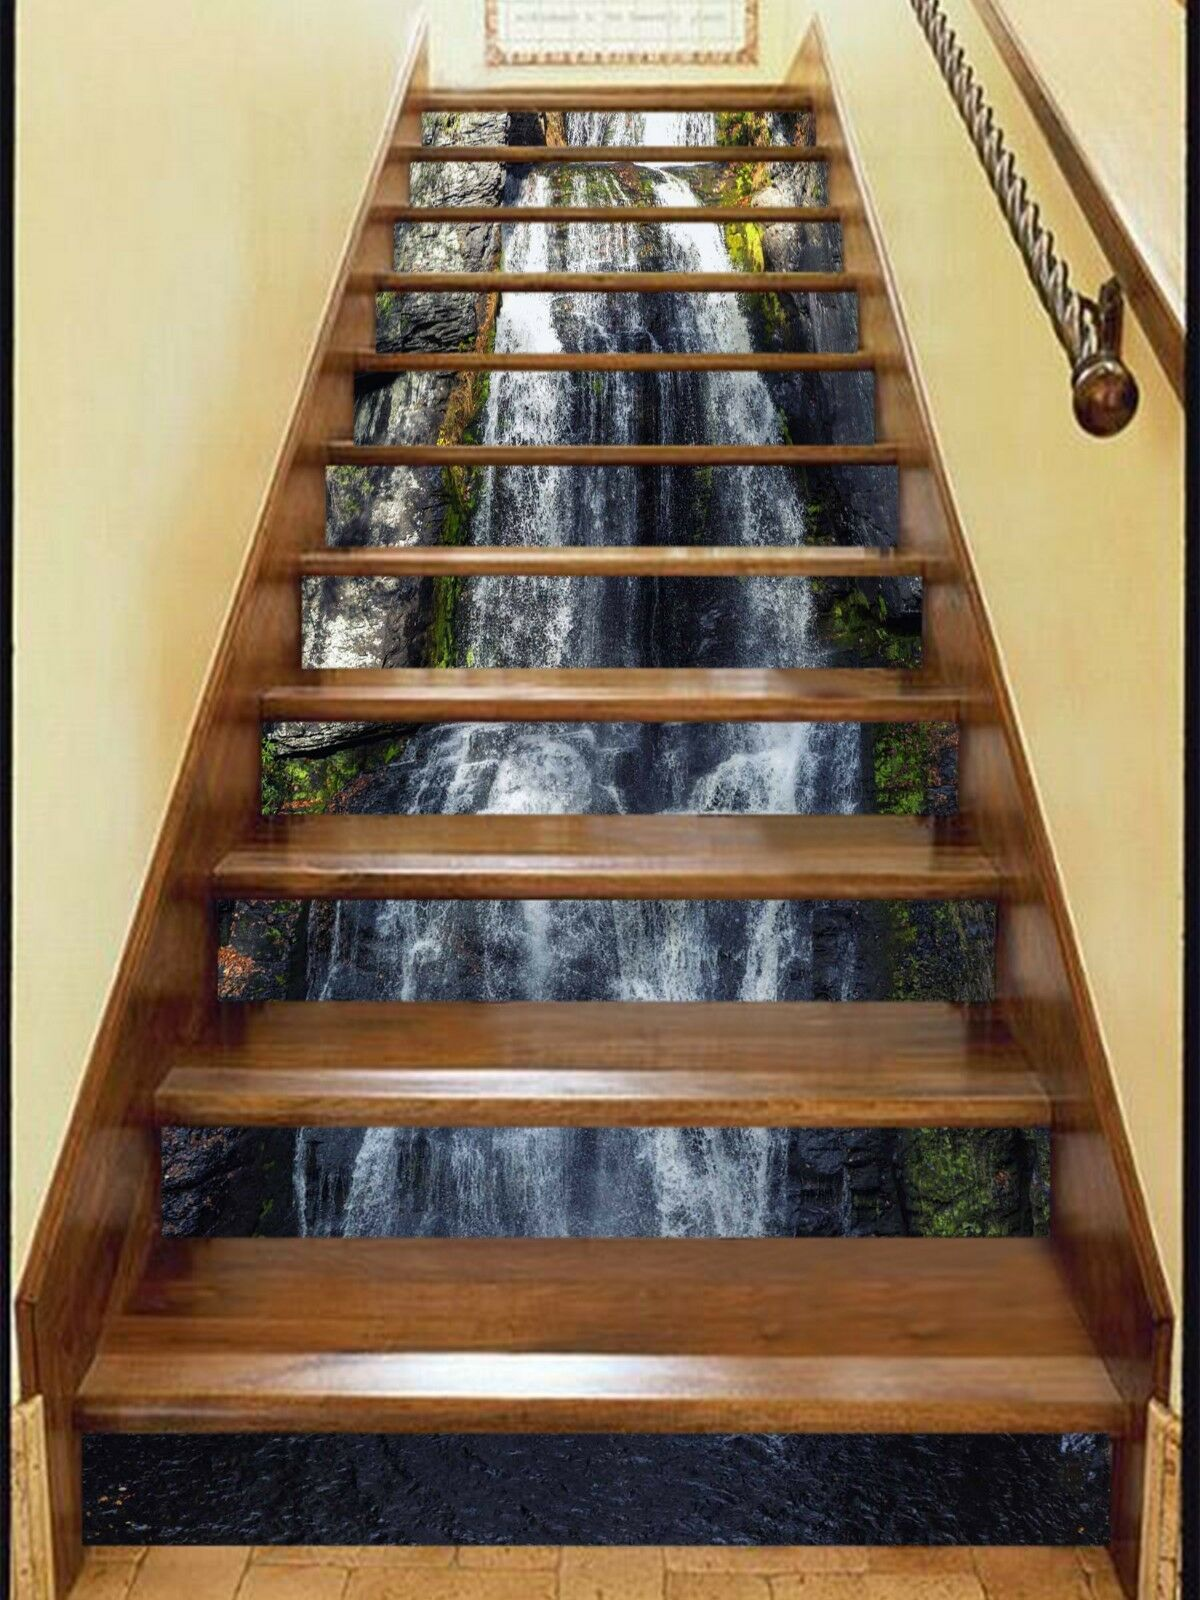 3D Adorn Waterfall Stair Risers Decoration Photo Mural Vinyl Decal Wallpaper US